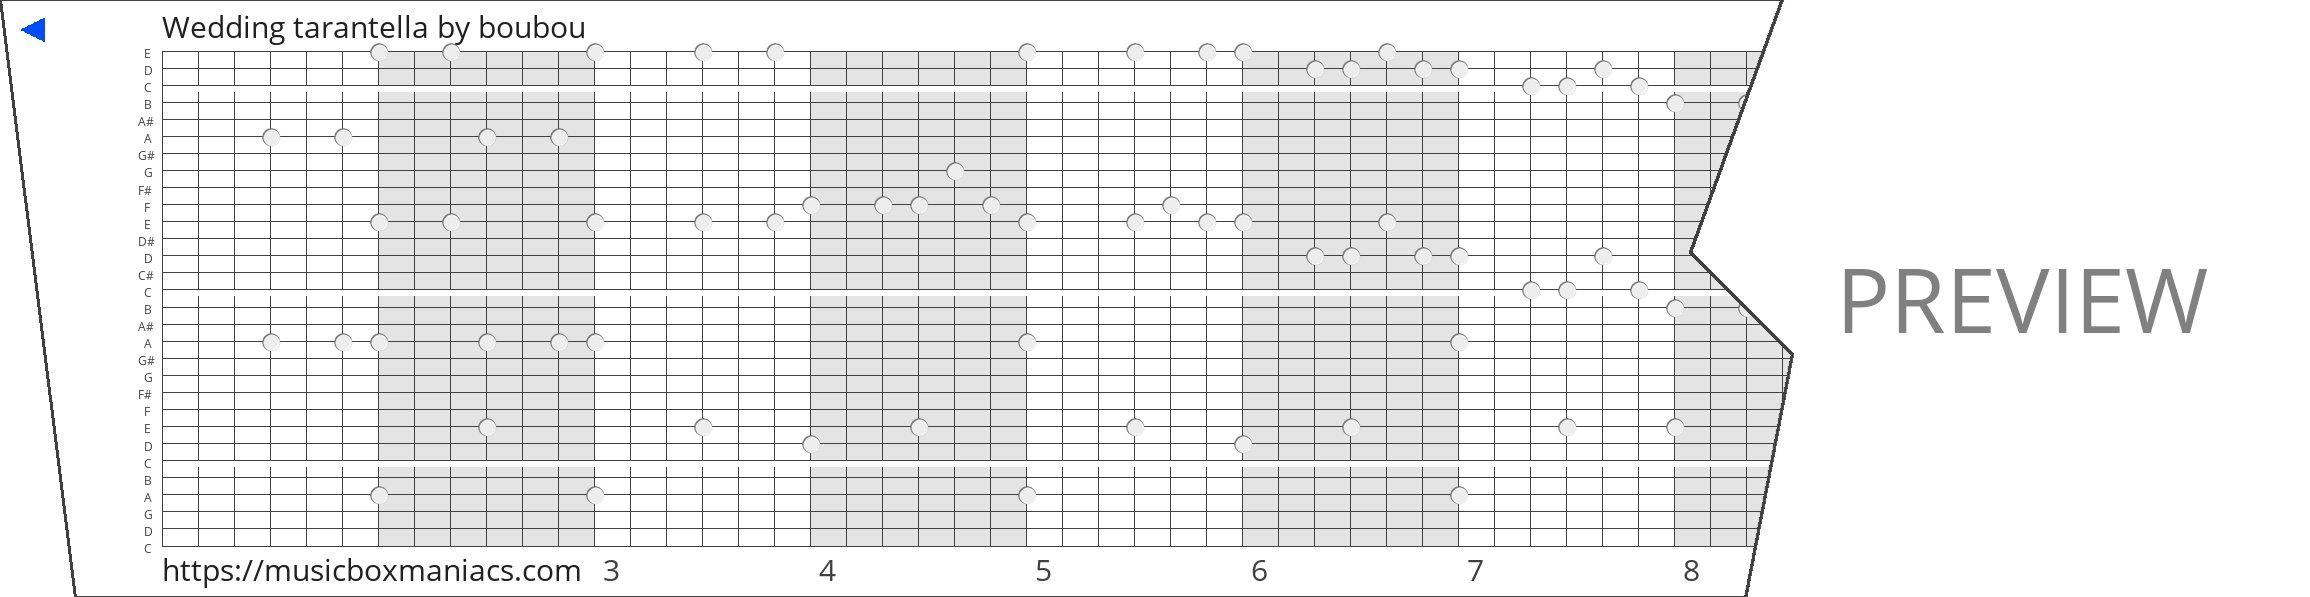 Wedding tarantella 30 note music box paper strip